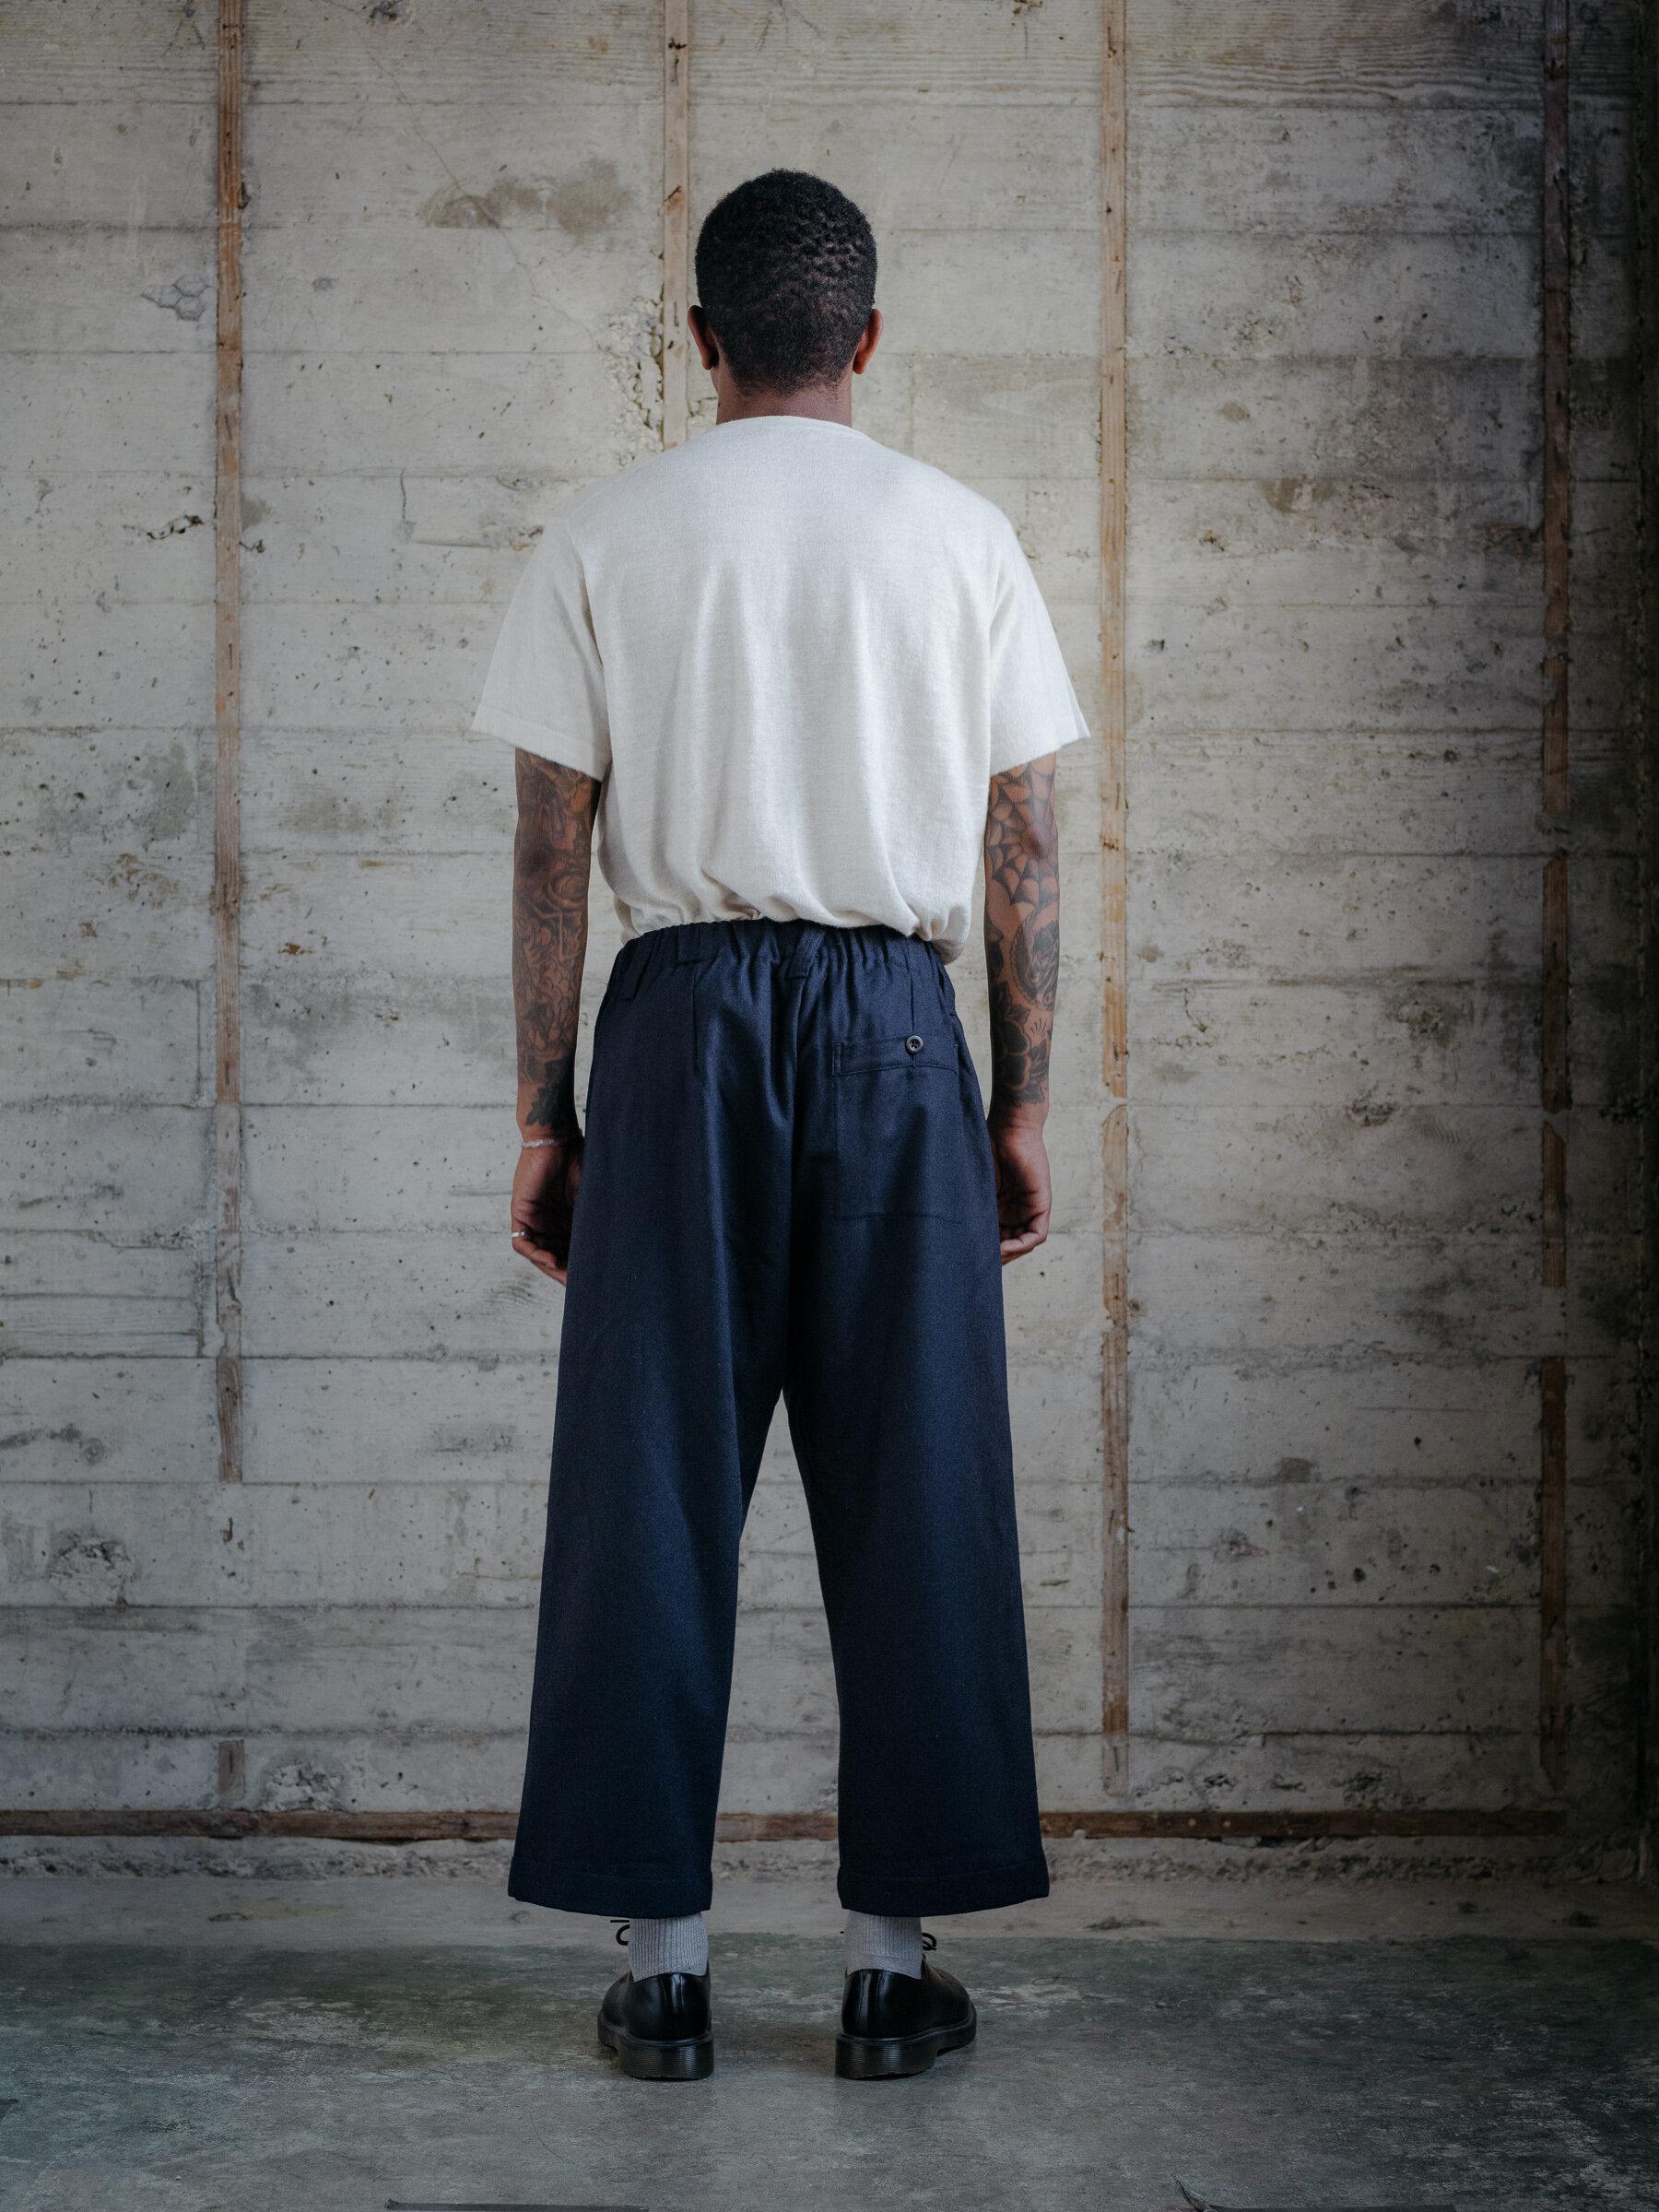 evan-kinori-elastic-pant-cashmere-lambswool-woven-in-england-made-in-san-francisco-3